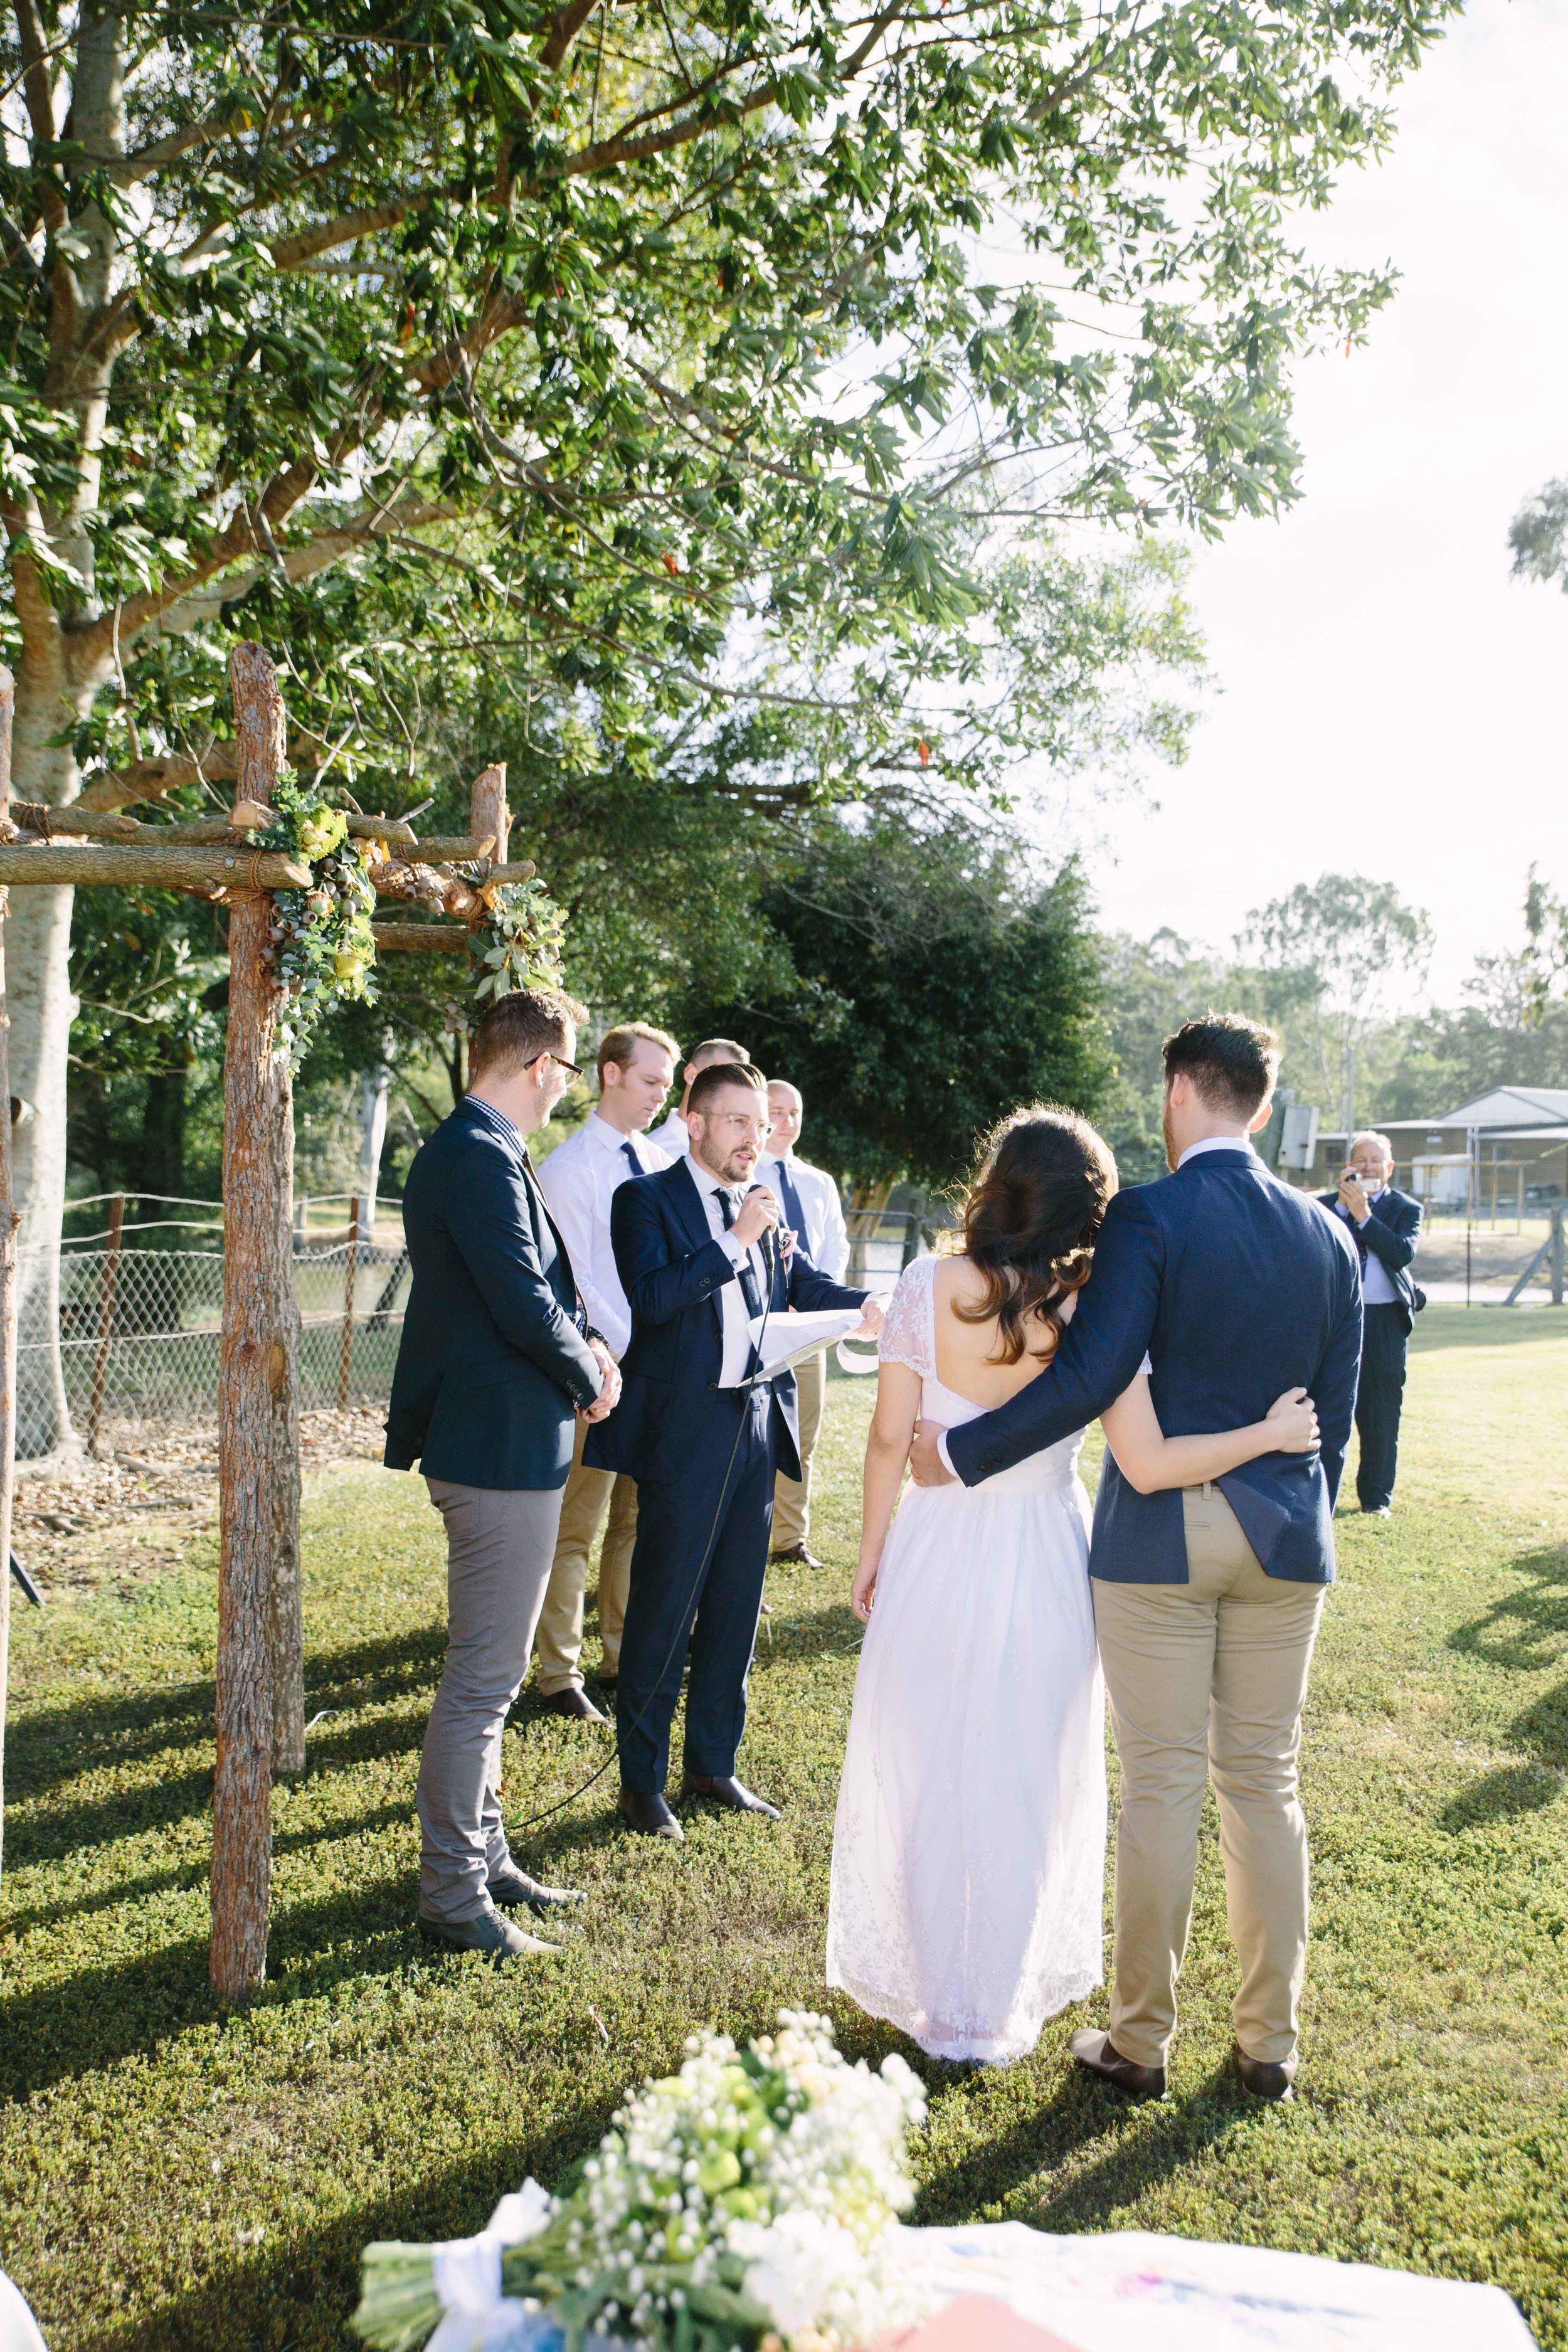 Ceremony_Camera 2_low res-5850.jpg